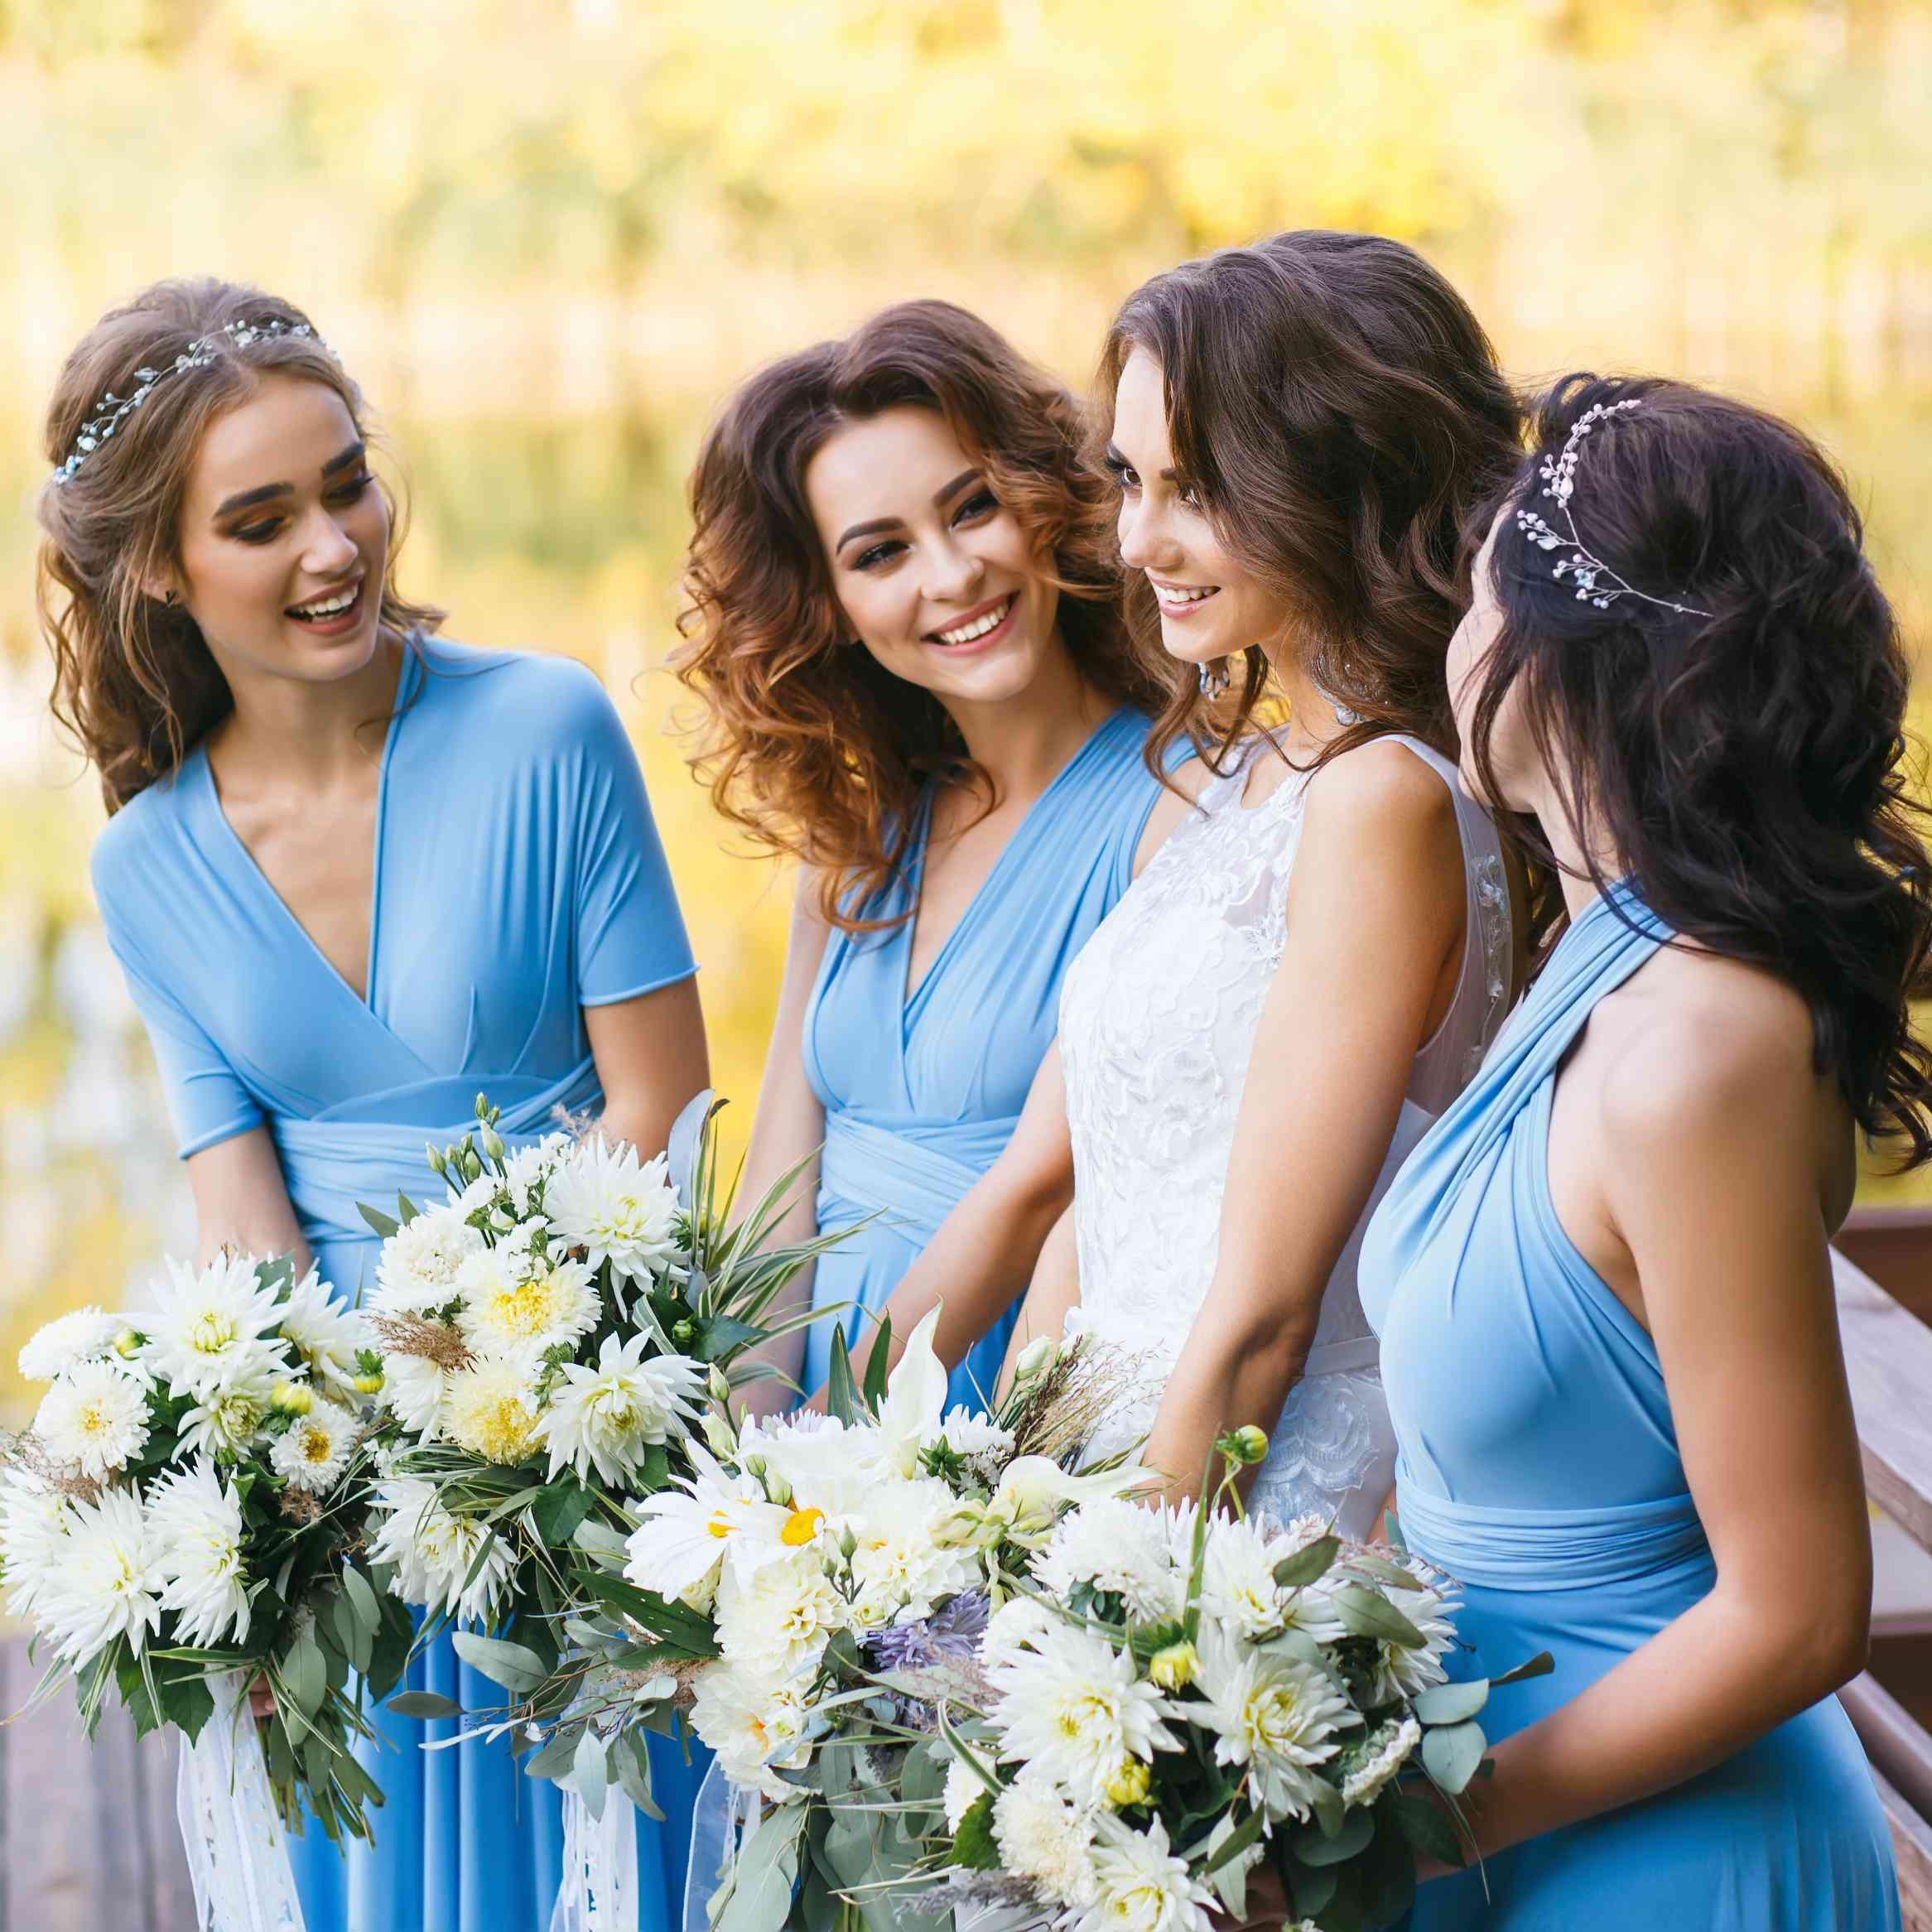 Insane Bridezilla Moments These Real Bridesmaids Lived Through